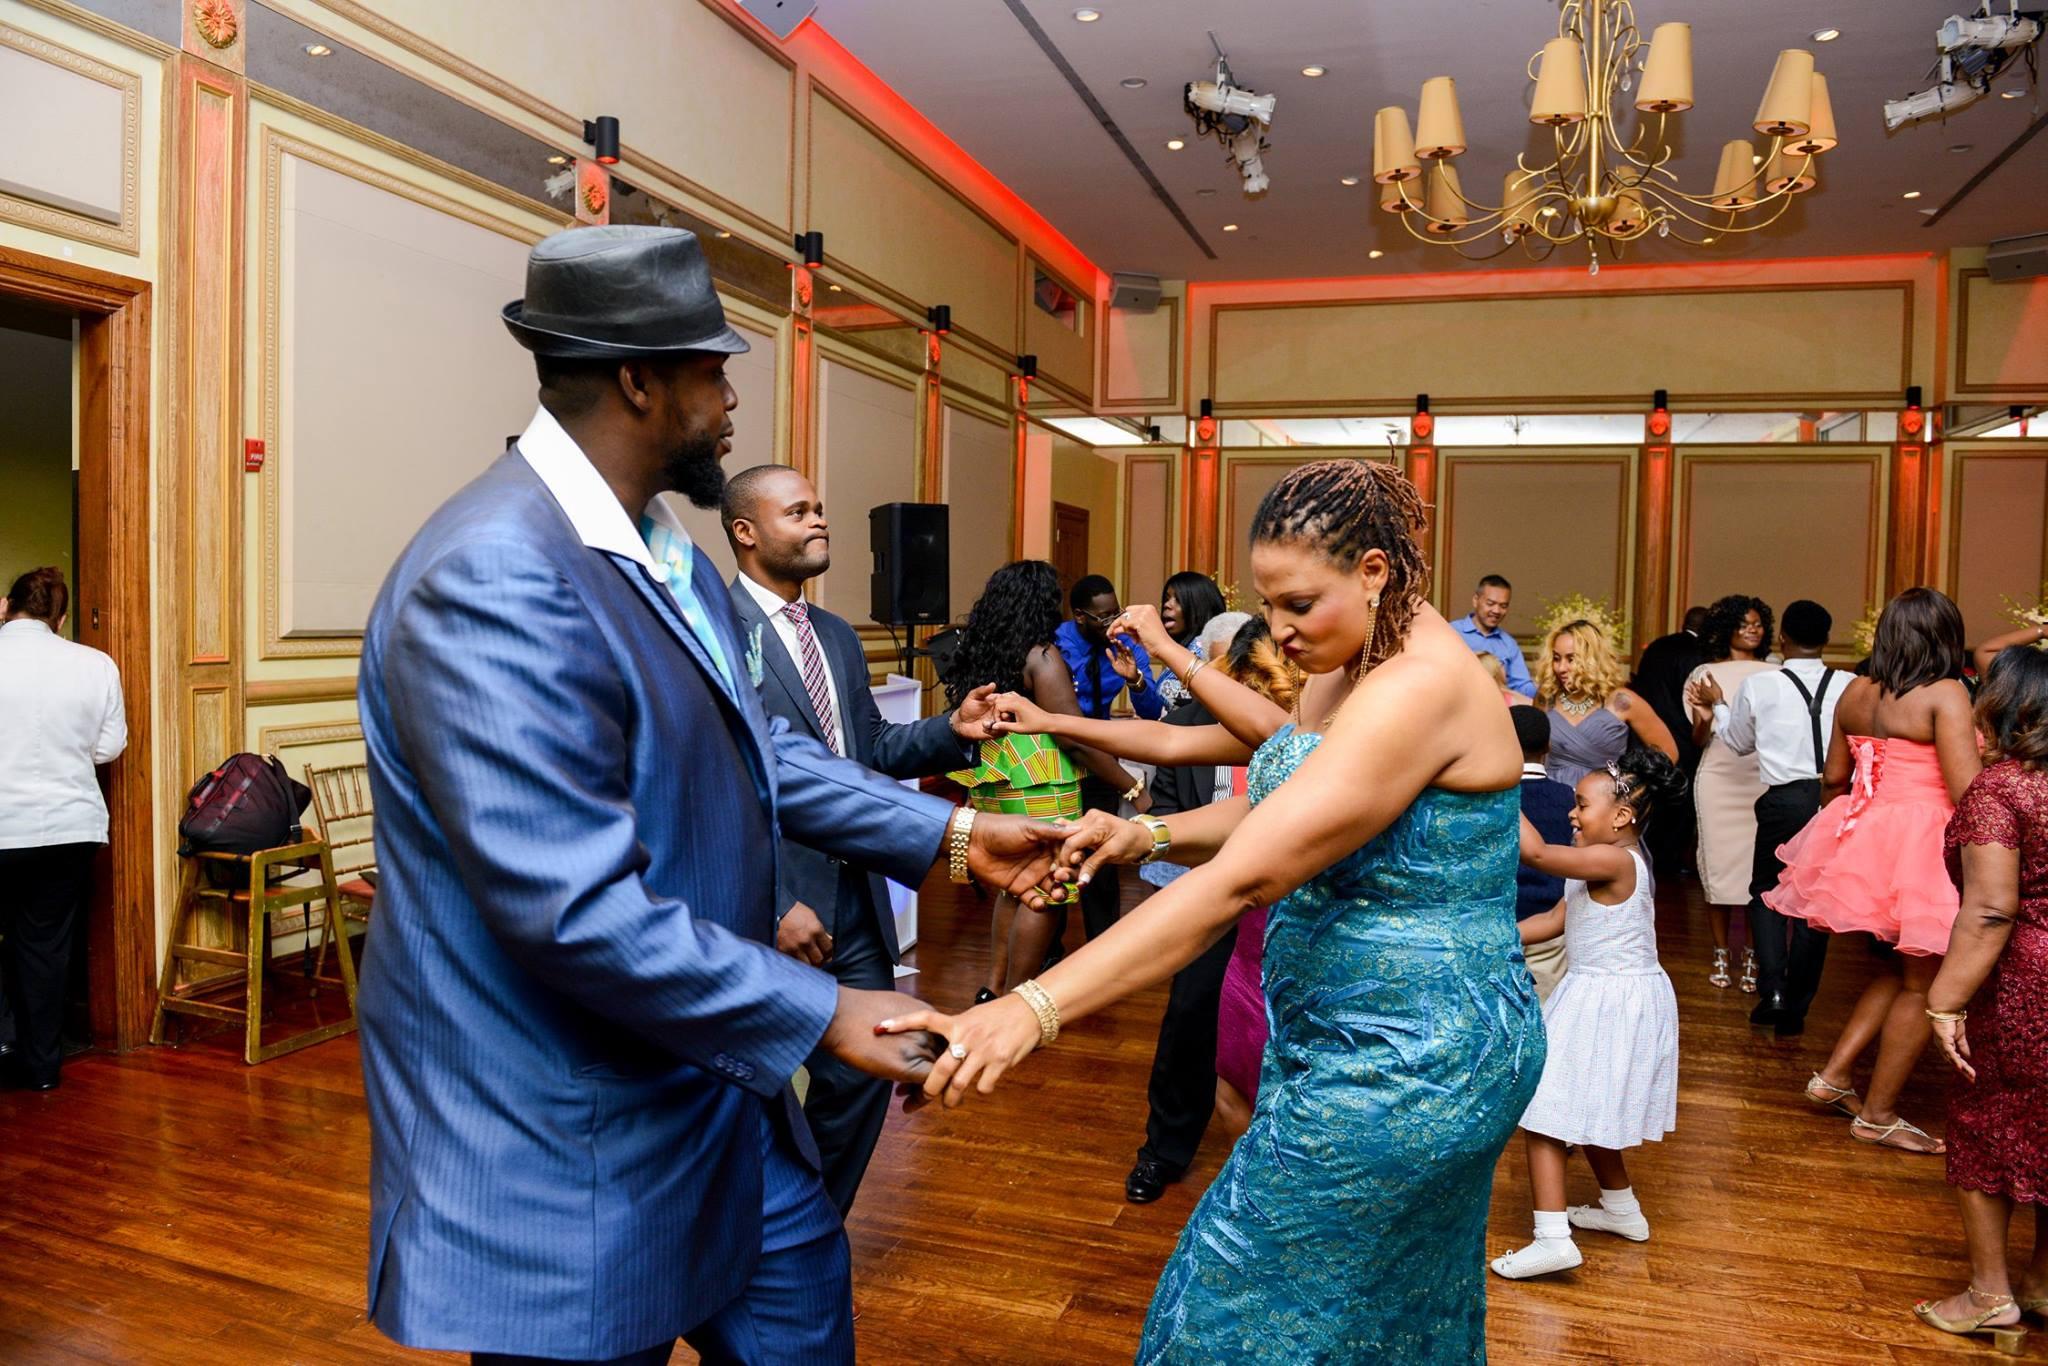 NYC Wedding Planner Bjorn & Company1.jpg